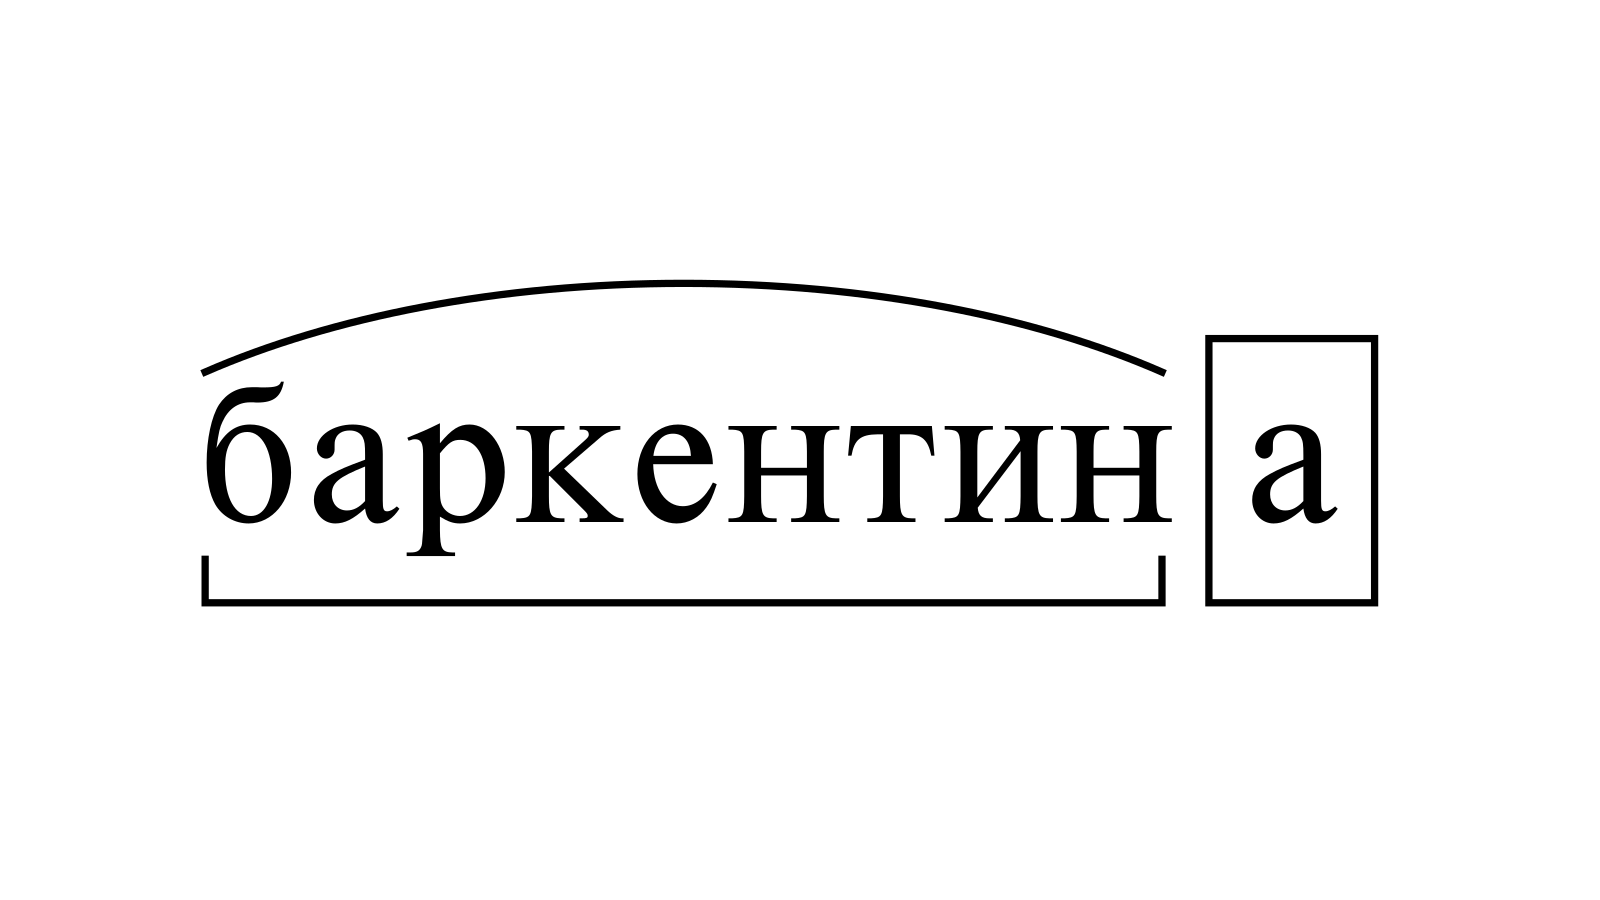 Разбор слова «баркентина» по составу